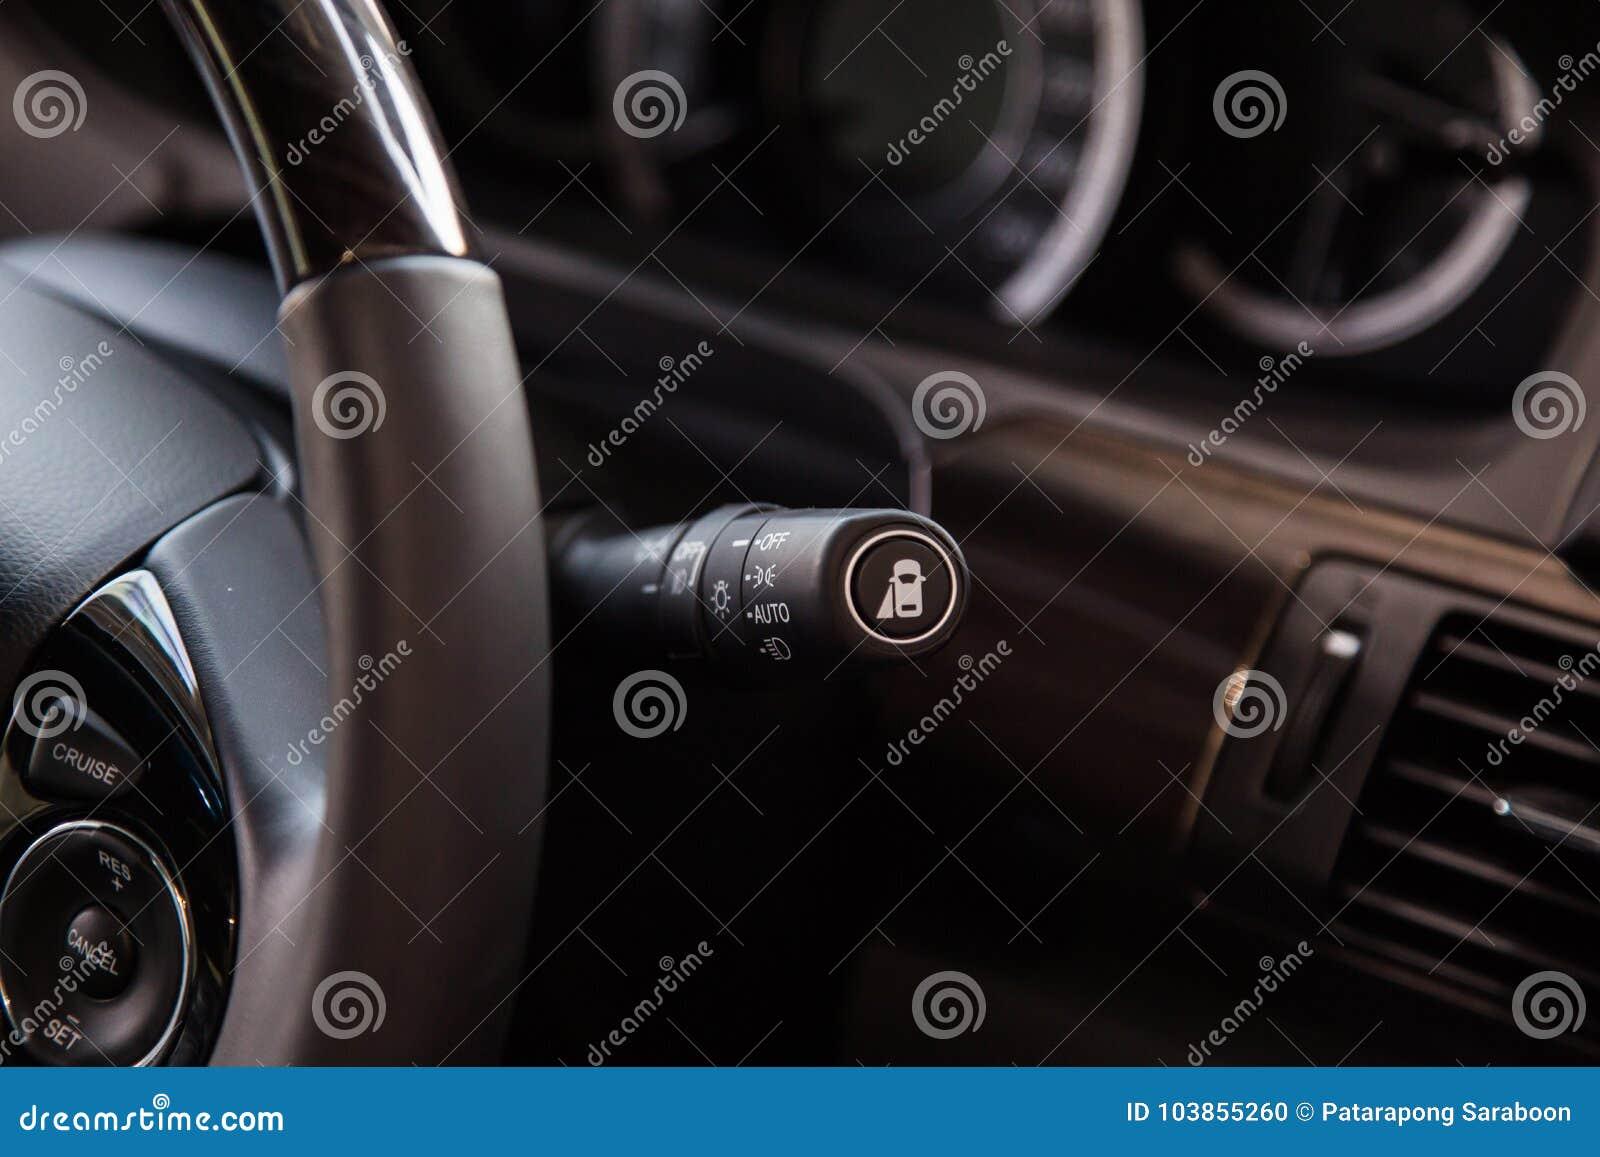 Lichte schakelaarcontrole in auto